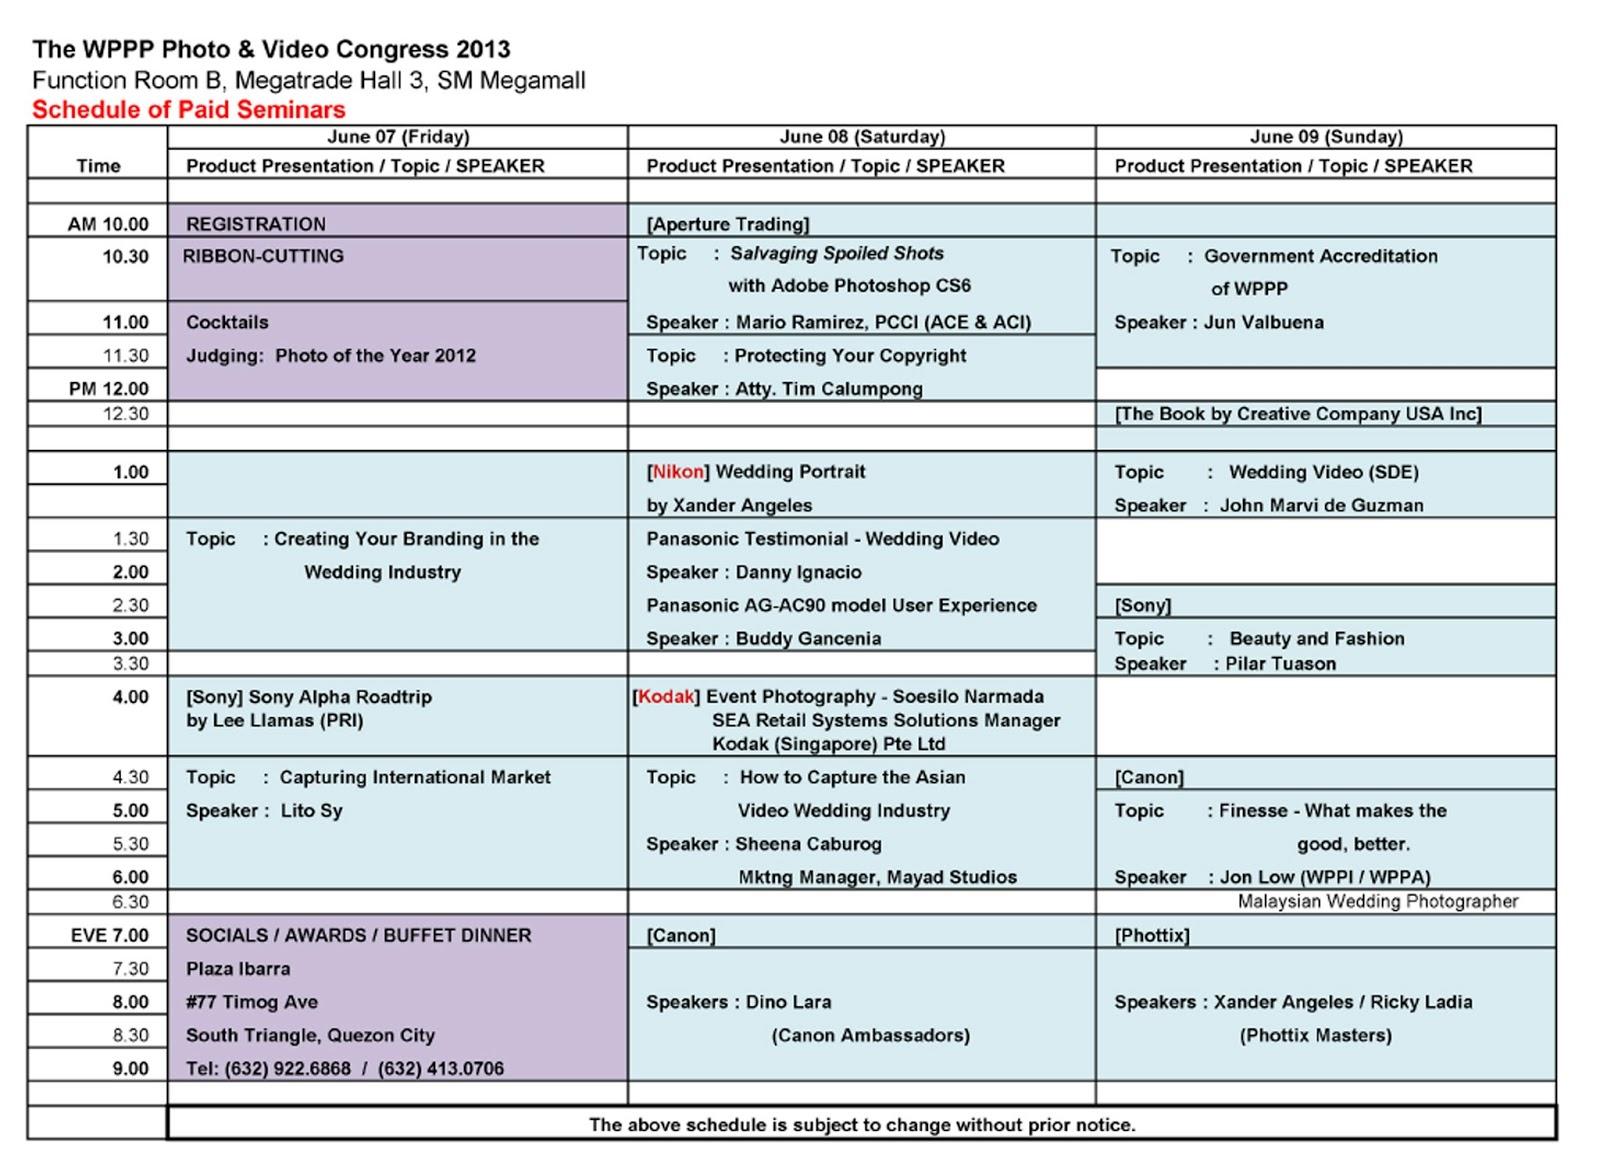 WPPP Schedule of Paid Seminars – Seminar Schedule Template